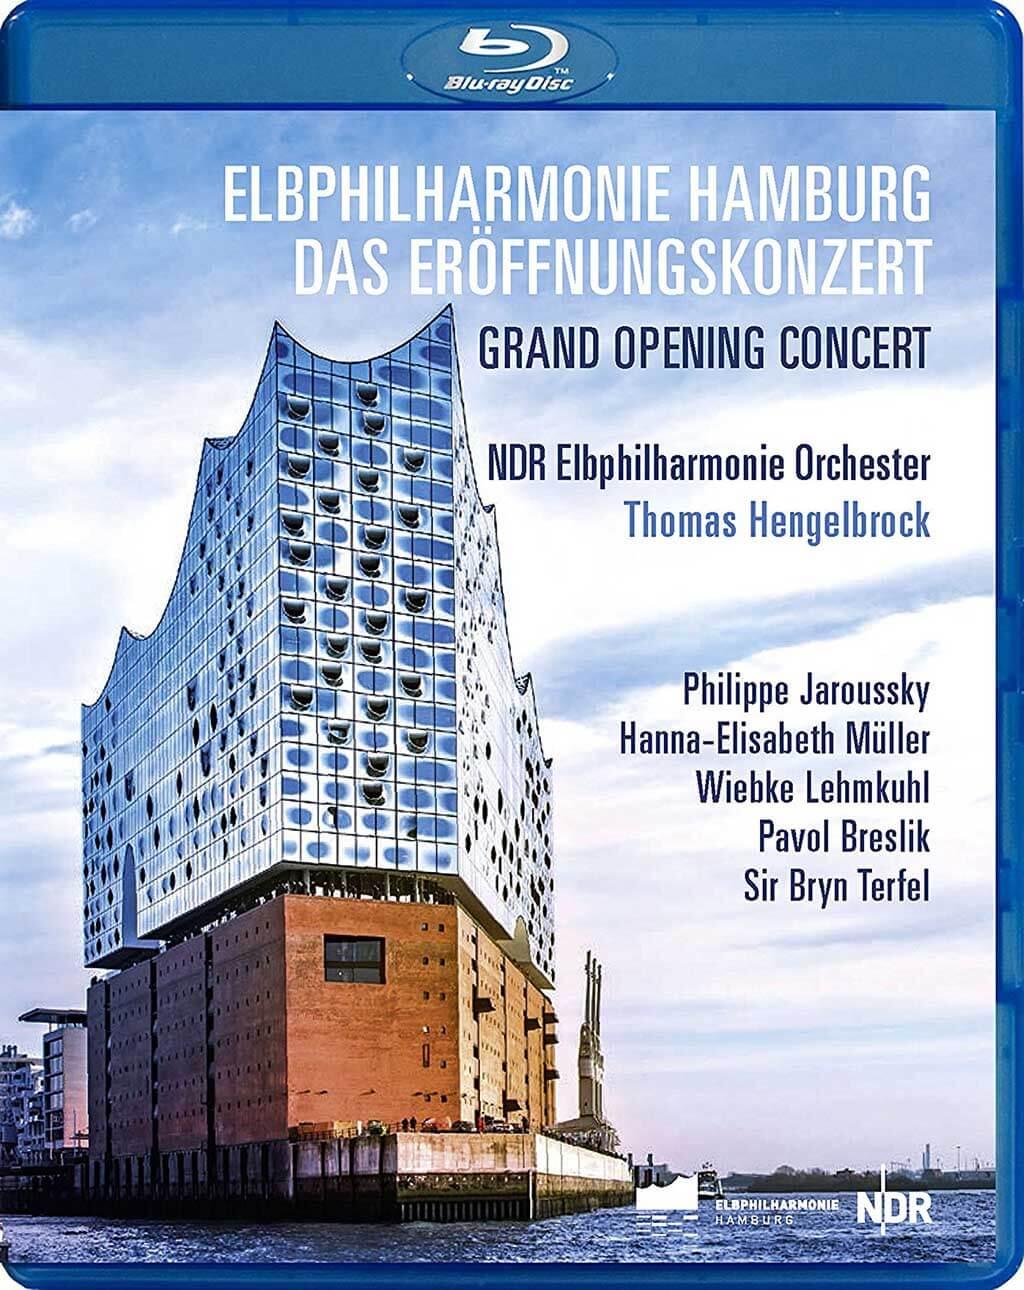 Elbphilharmonie Hamburg Grand Opening Concert. Music by Britten, Dutilleux, Cavalieri, Messiaen, Rihm, Beethoven, etc. Philippe Jaroussky, countertenor; Hanna-Elisabeth Müller, soprano, Wiebke Lehmkuhl, mezzo-soprano; Pavol Breslik, tenor; Bryn Terfel, bass. NDR Chorus & Bavarian Radio Chorus. NDR Elbphilharmonie Orchester/Thomas Hengelbrock. Bonus Documentary: The Elbphilharmonie – Hamburg's New Landmark. C major Blu-ray Disc 741504. Total Time: 165:00.